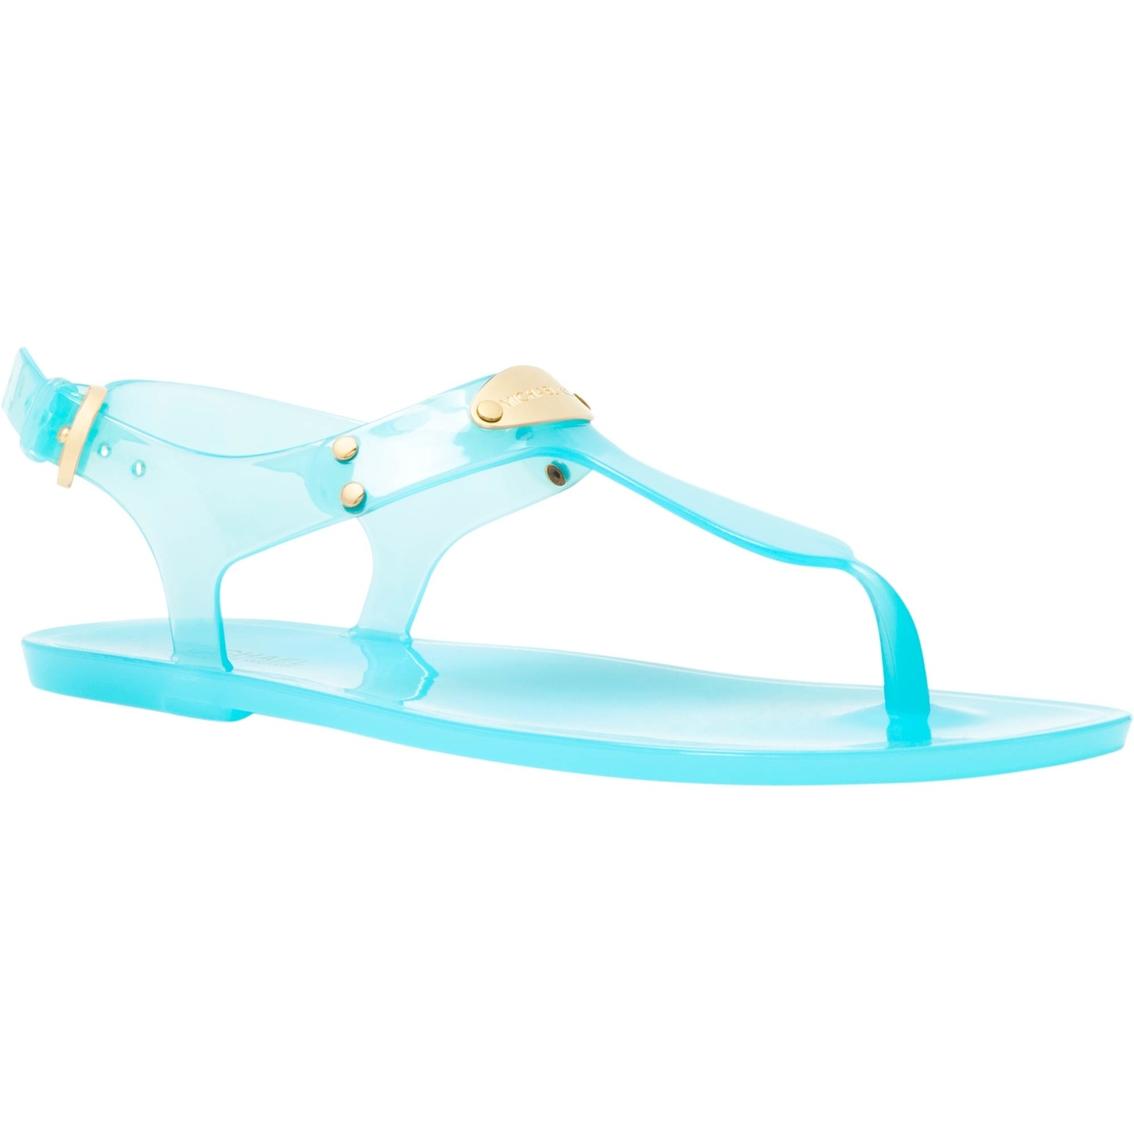 0b78620ab459 Michael Kors Plate Jelly Sandals